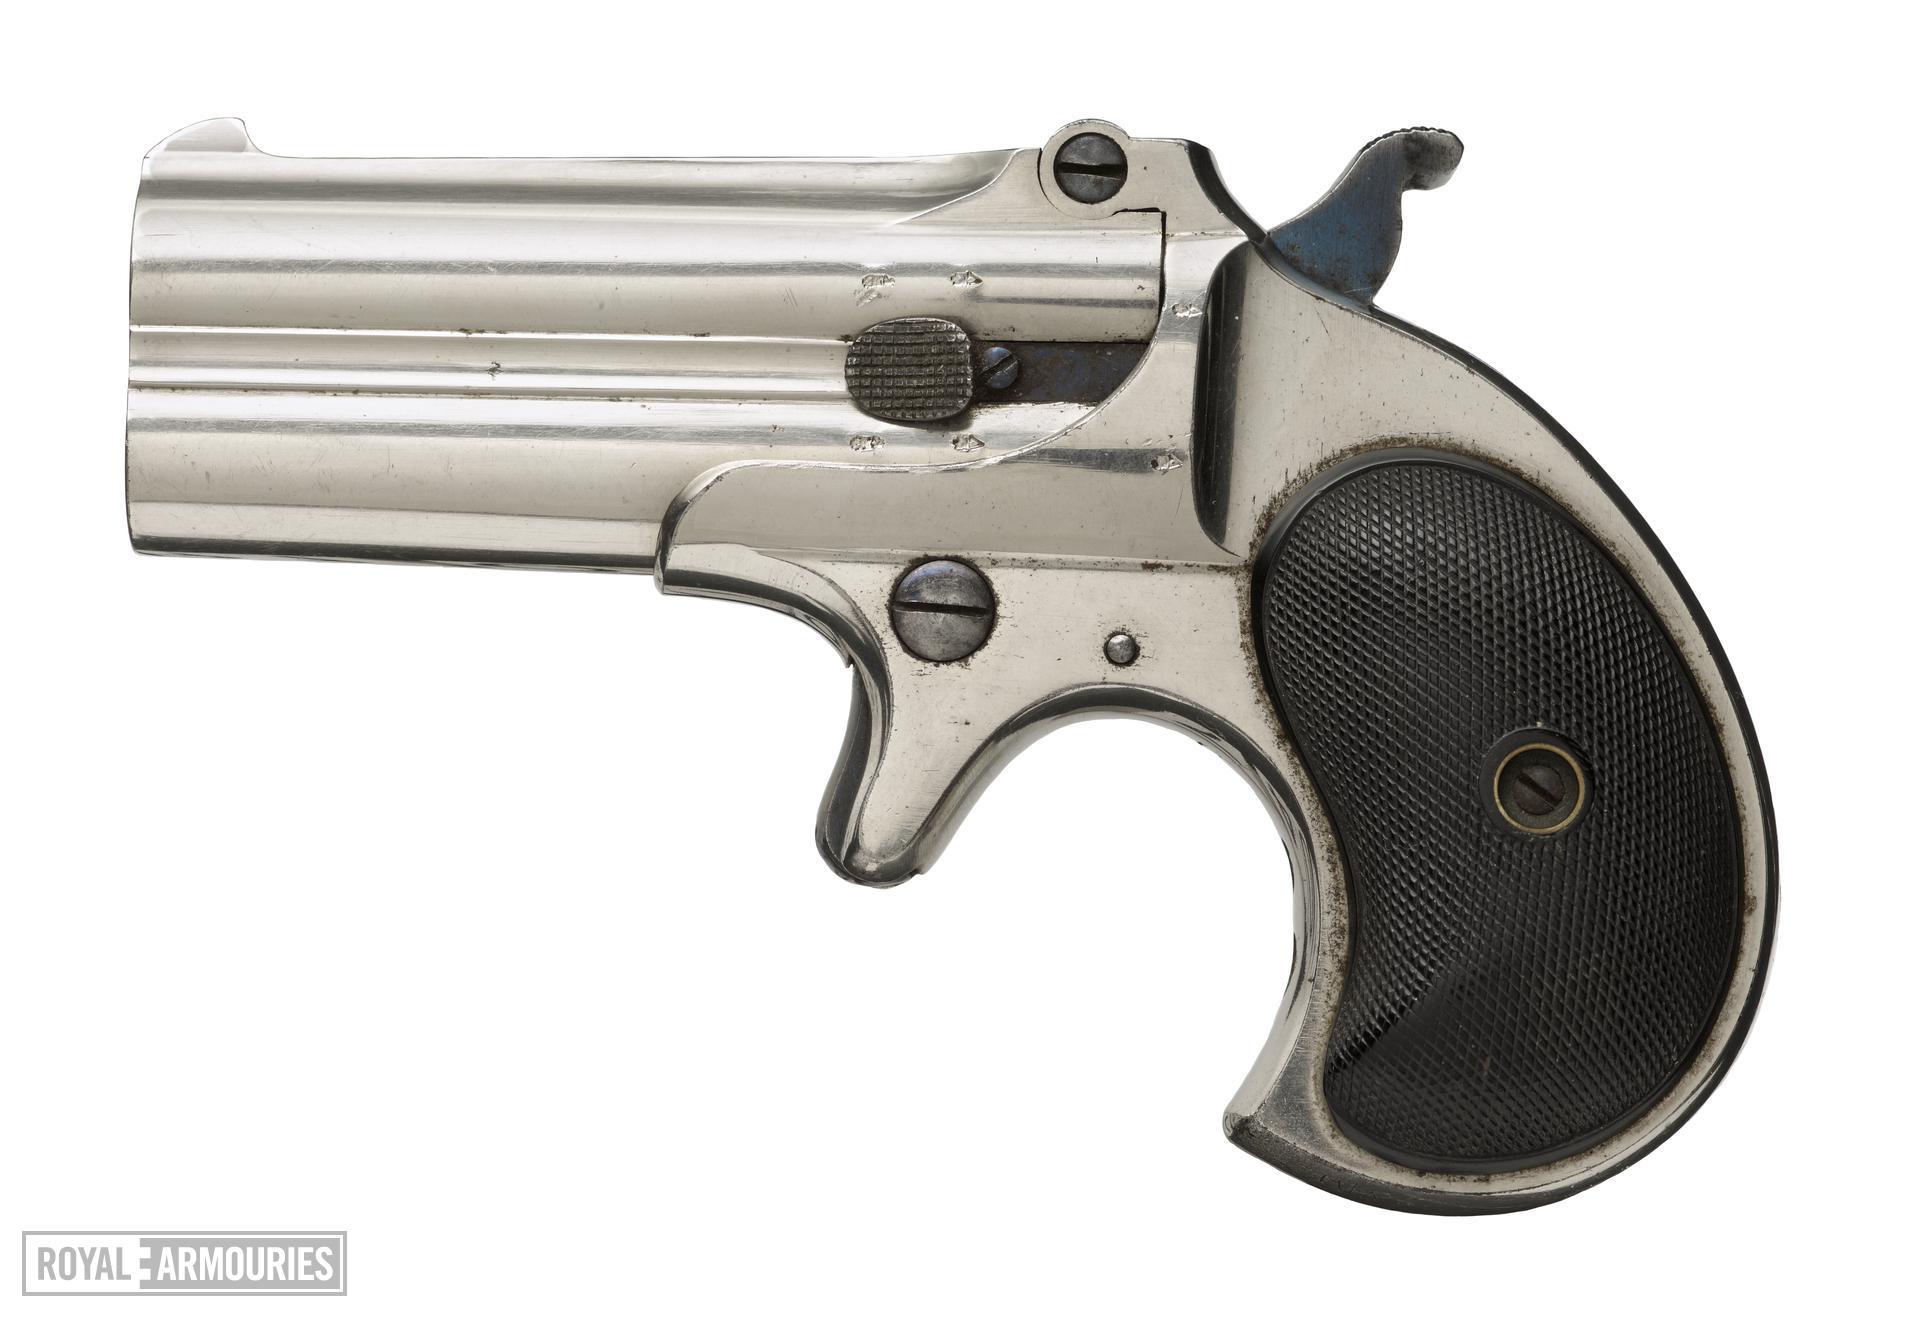 Rimfire breech-loading double-barrelled derringer pistol - Remington-Elliot Pattern Double Derringer